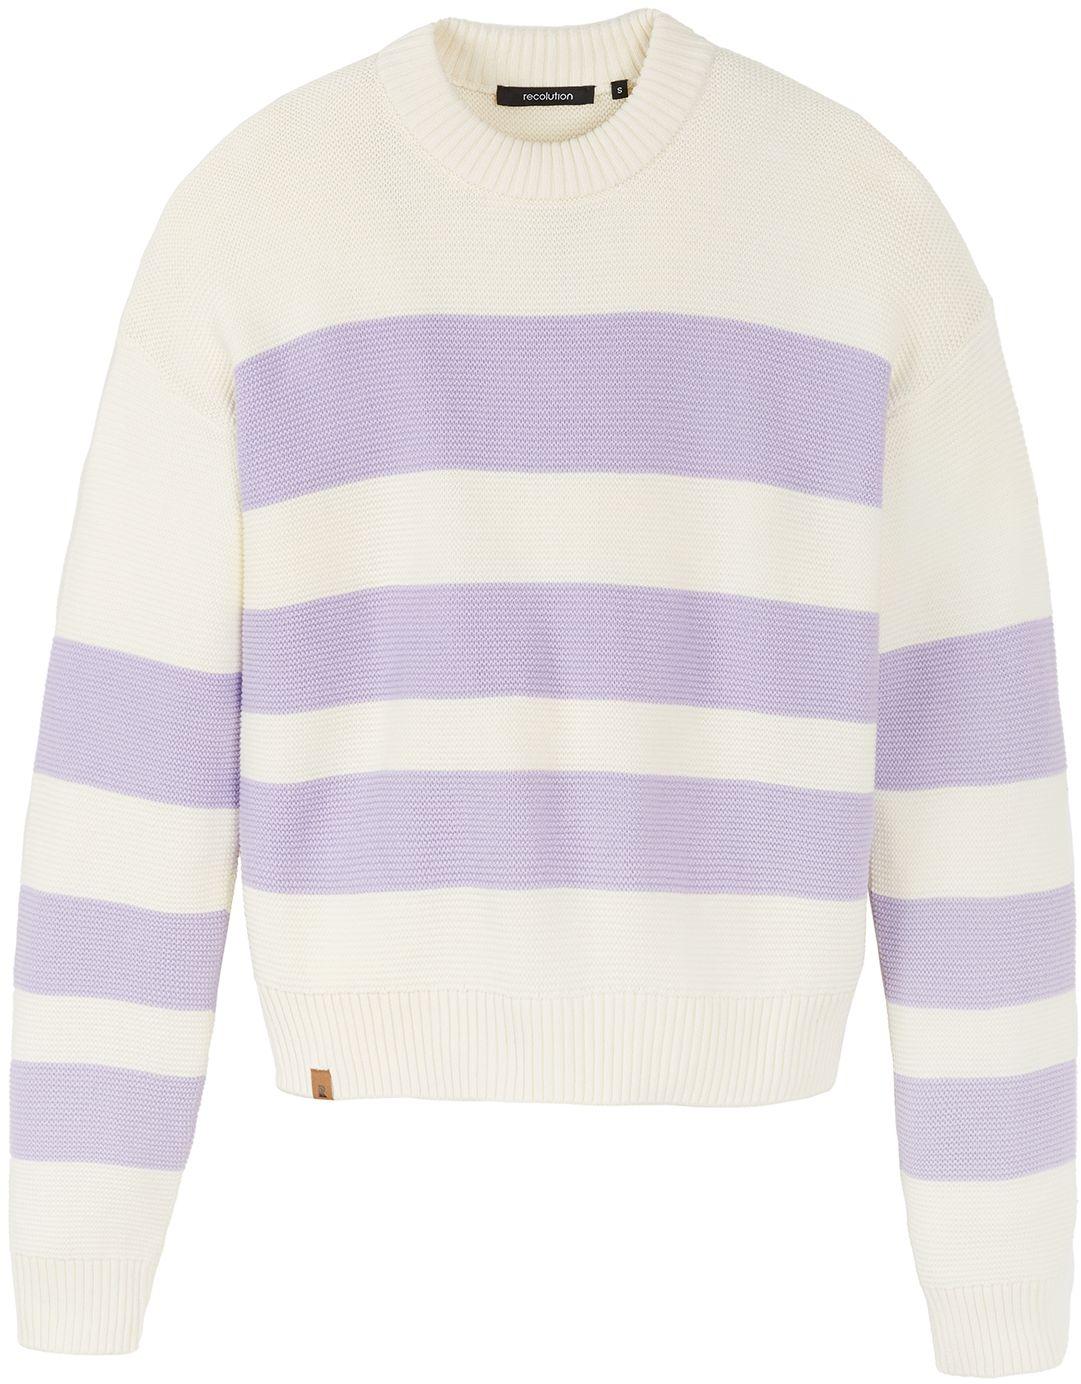 Damen-Strickpullover LILAC creme/ lilac